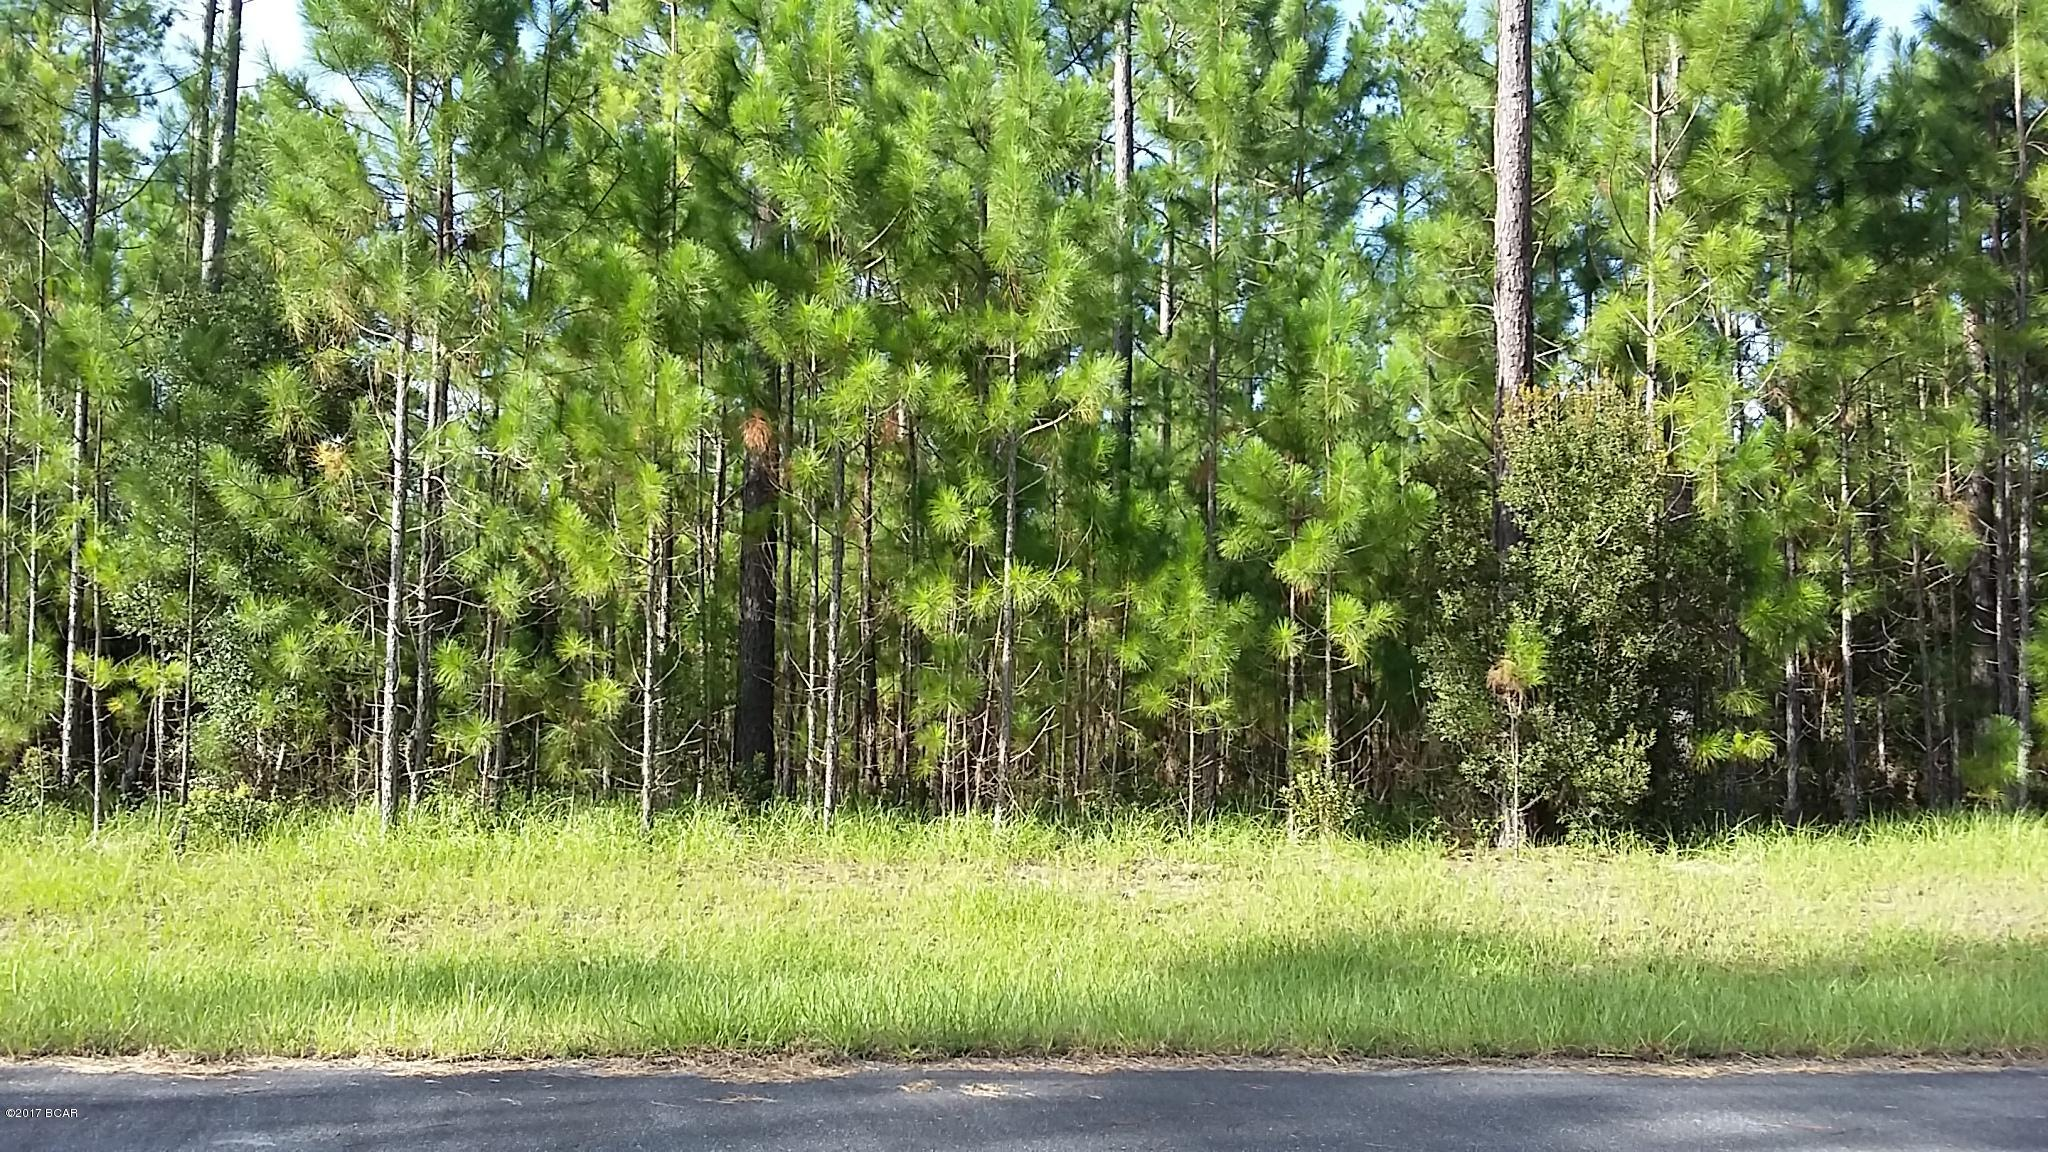 Photo of 4 ACRES CYPRESS CROSSING Road Vernon FL 32462